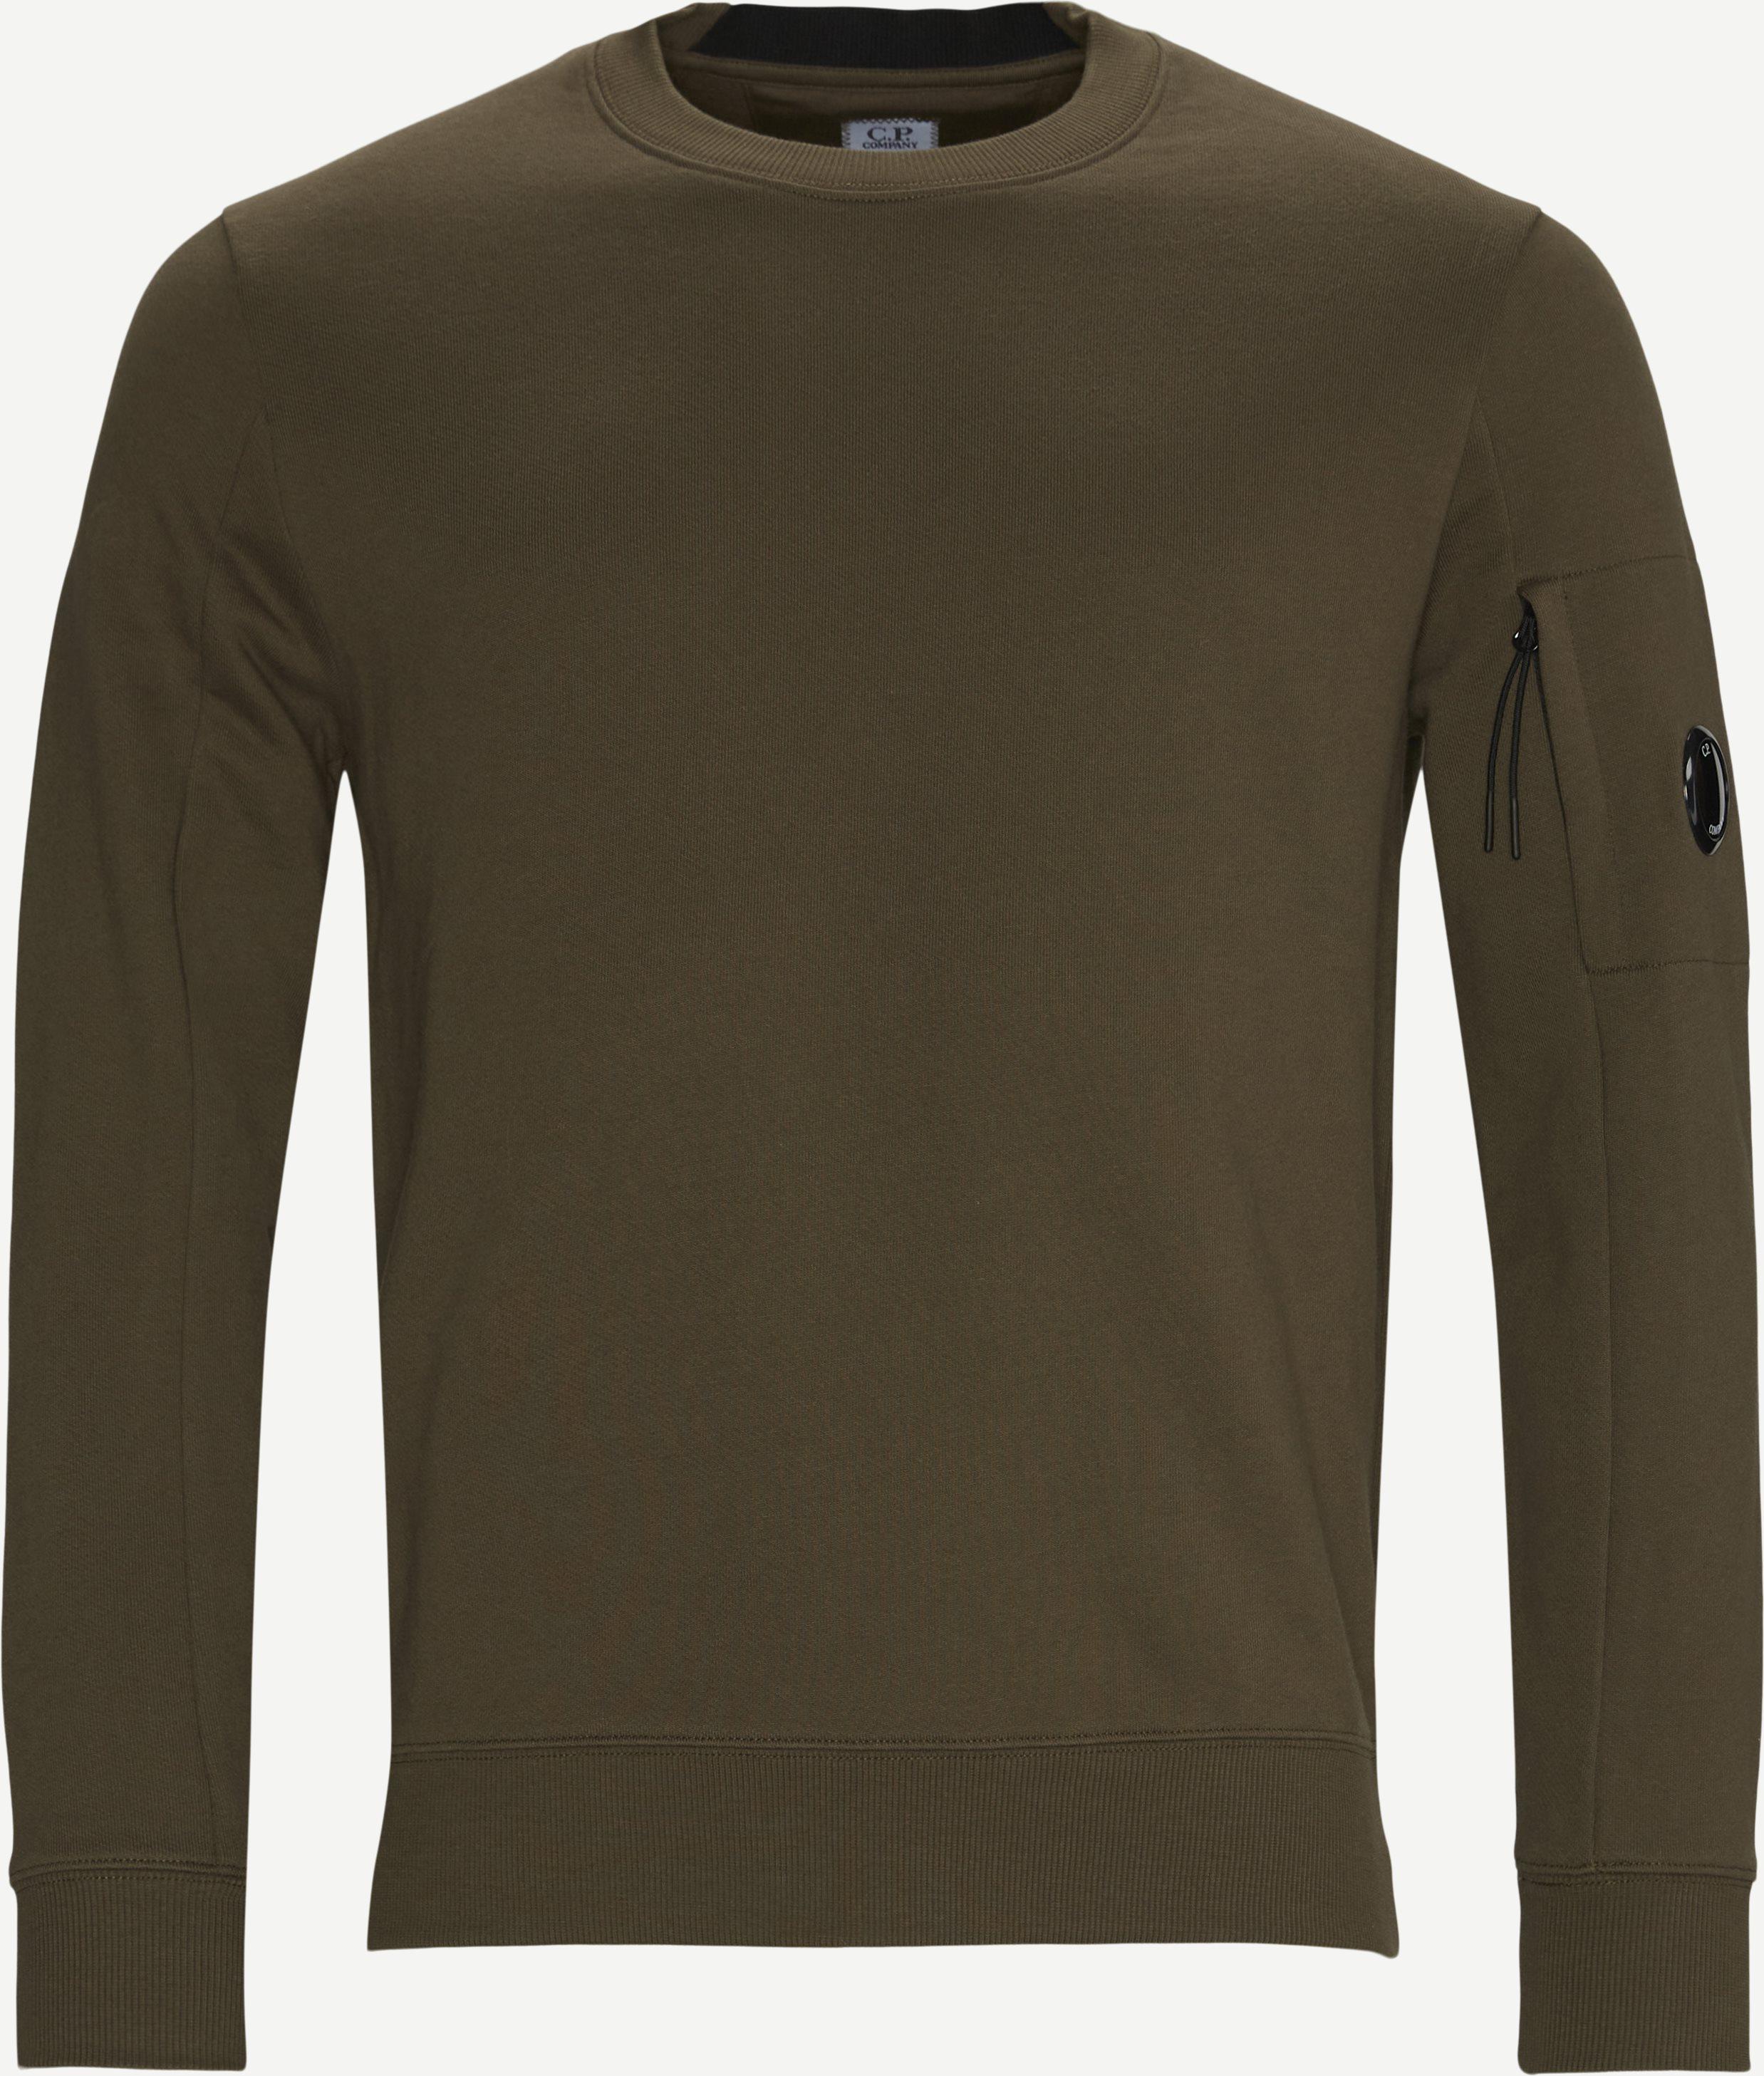 Garment Dyed Light Fleece Lens Crew Sweat - Sweatshirts - Regular - Army